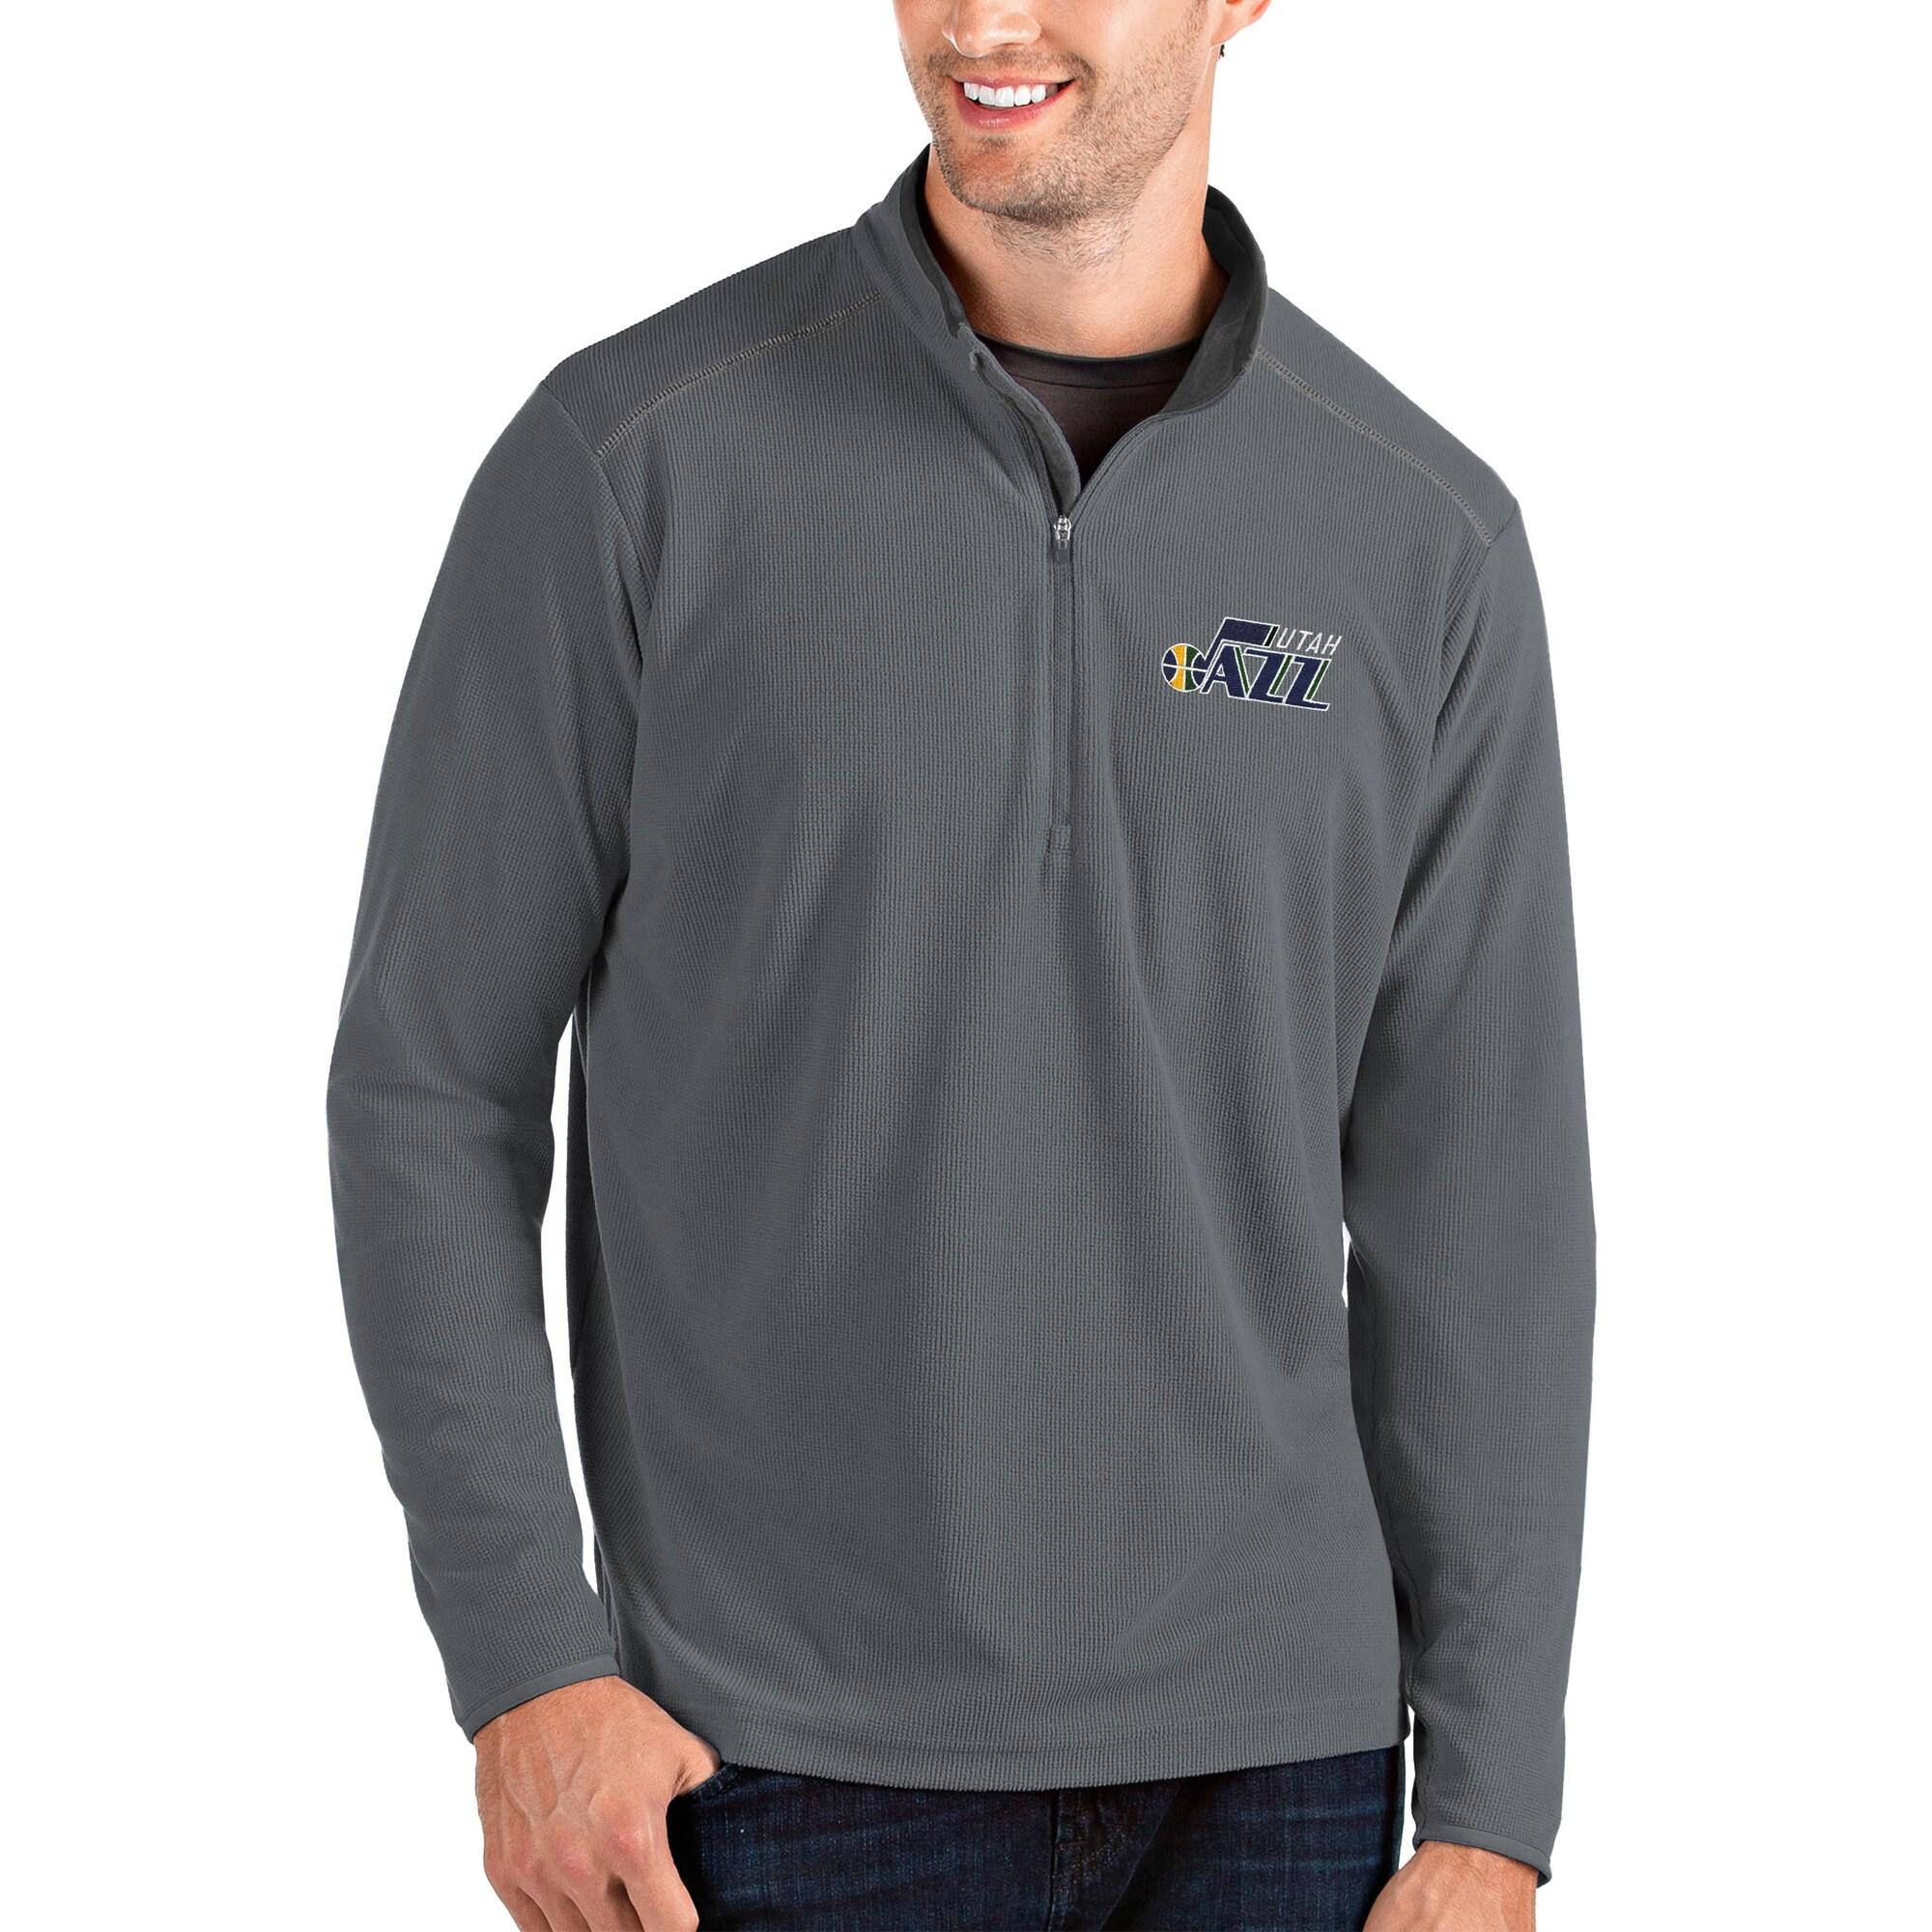 Utah Jazz Antigua Glacier Quarter-Zip Pullover Jacket - Charcoal/Gray